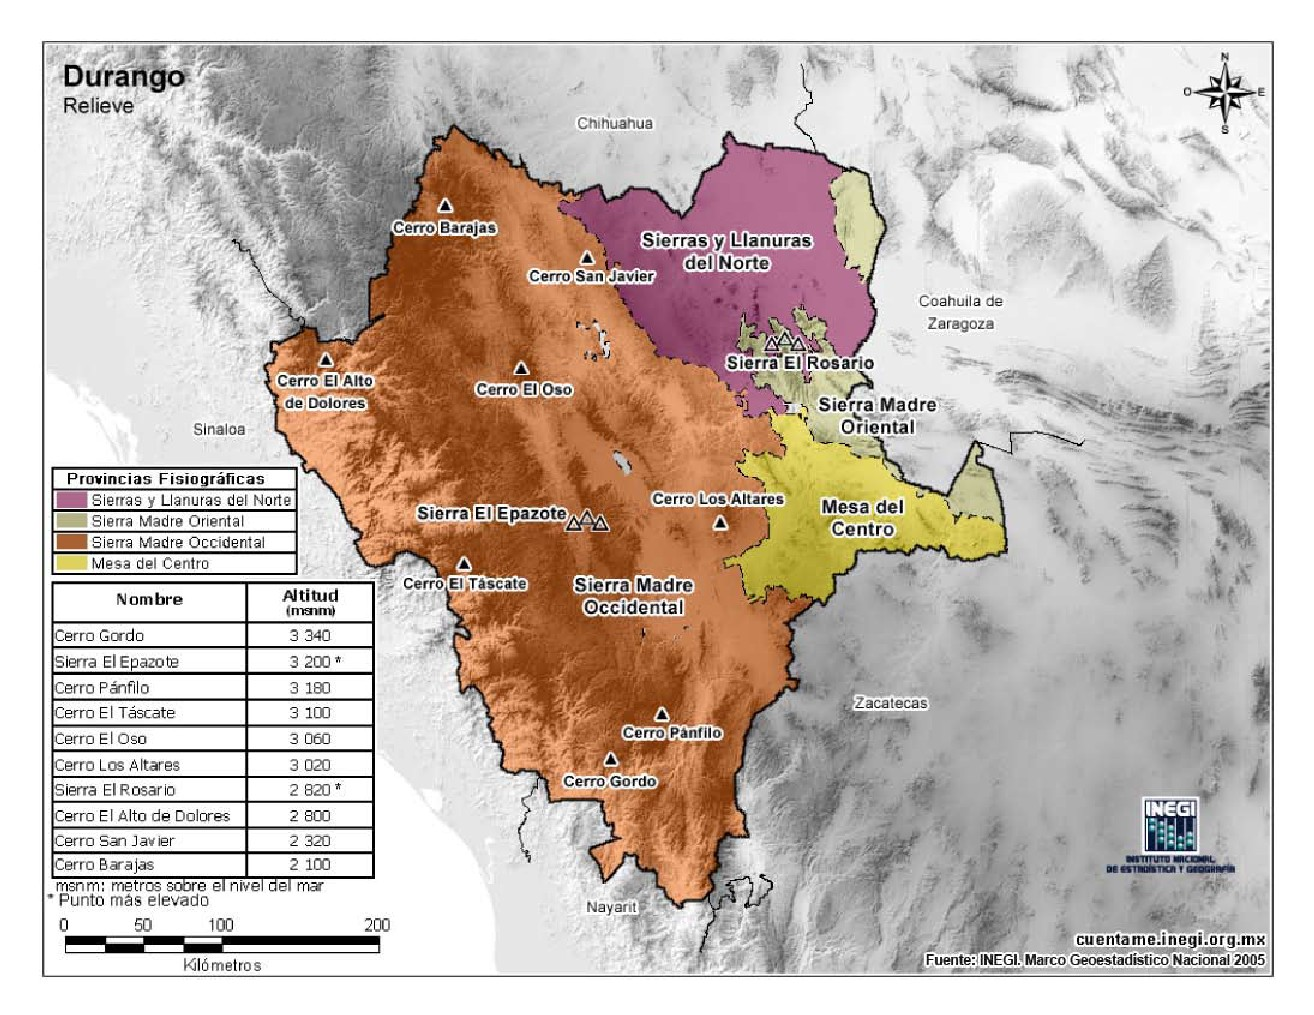 Mapa en color de montañas de Durango. INEGI de México